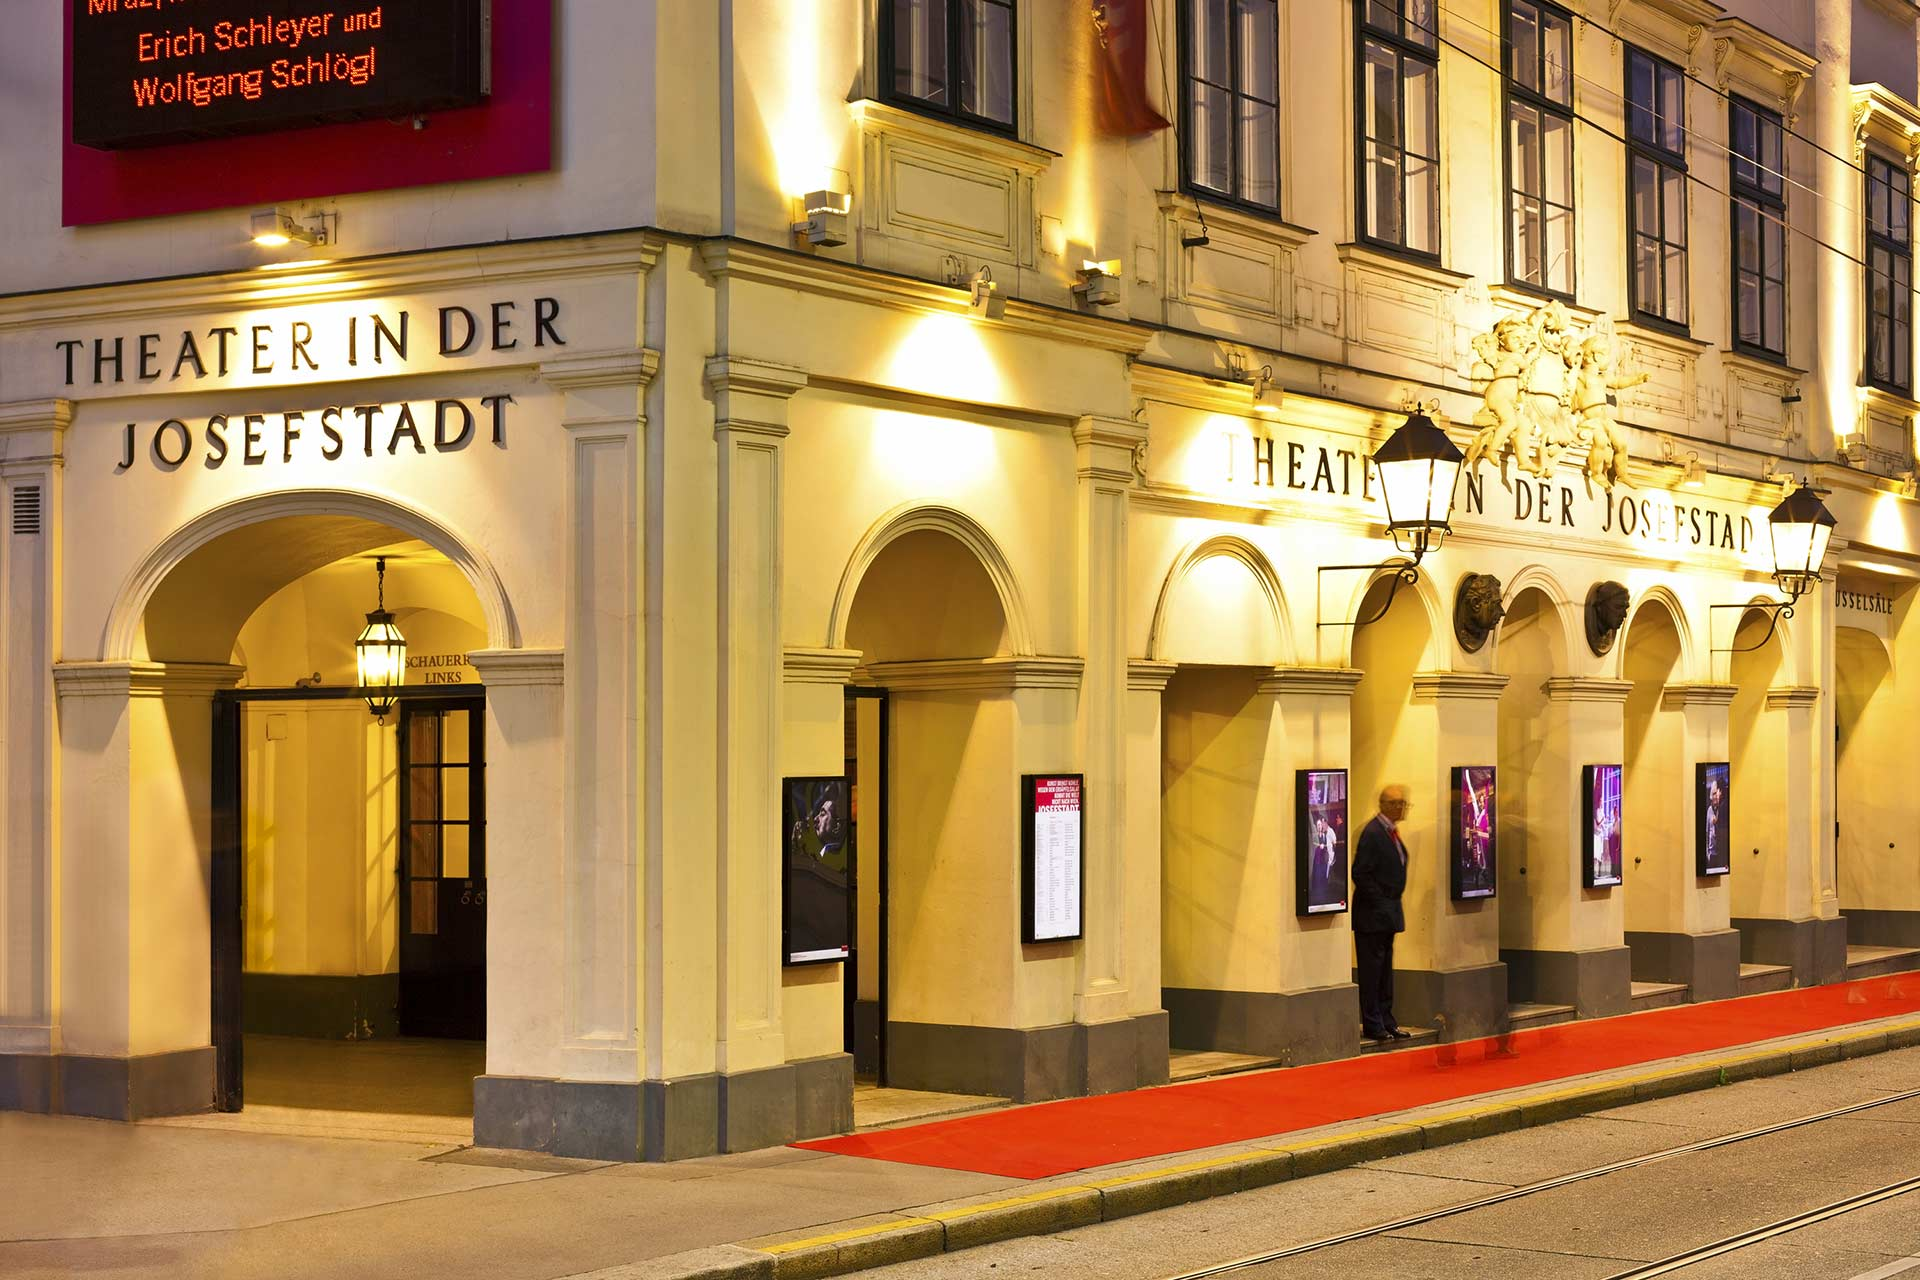 theaterjosefstadt